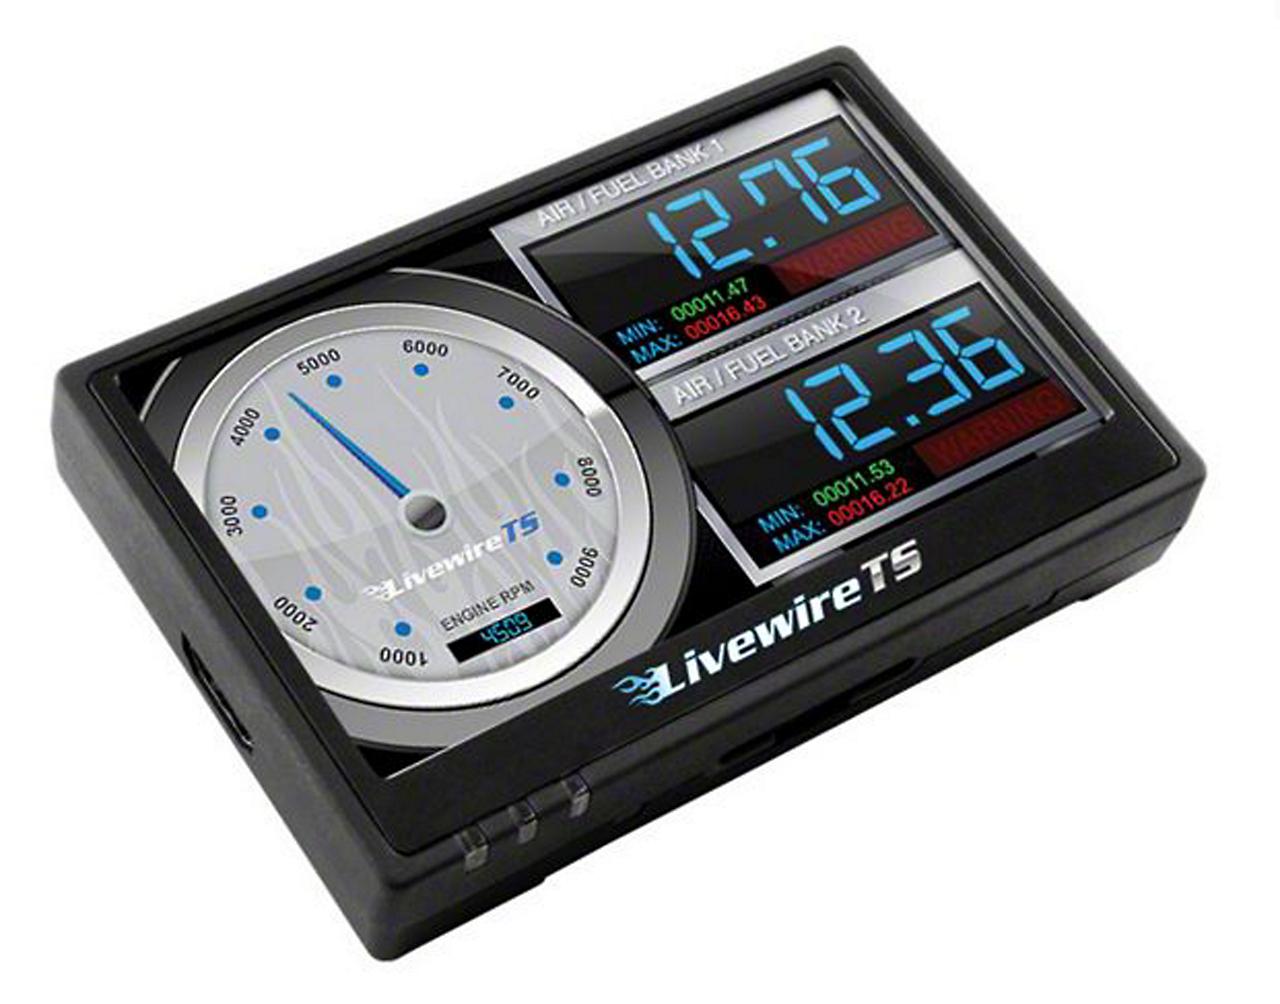 MPT Livewire TS+ w/ 1 Custom Tune (11-14 5.0L w/ Roush Supercharger)